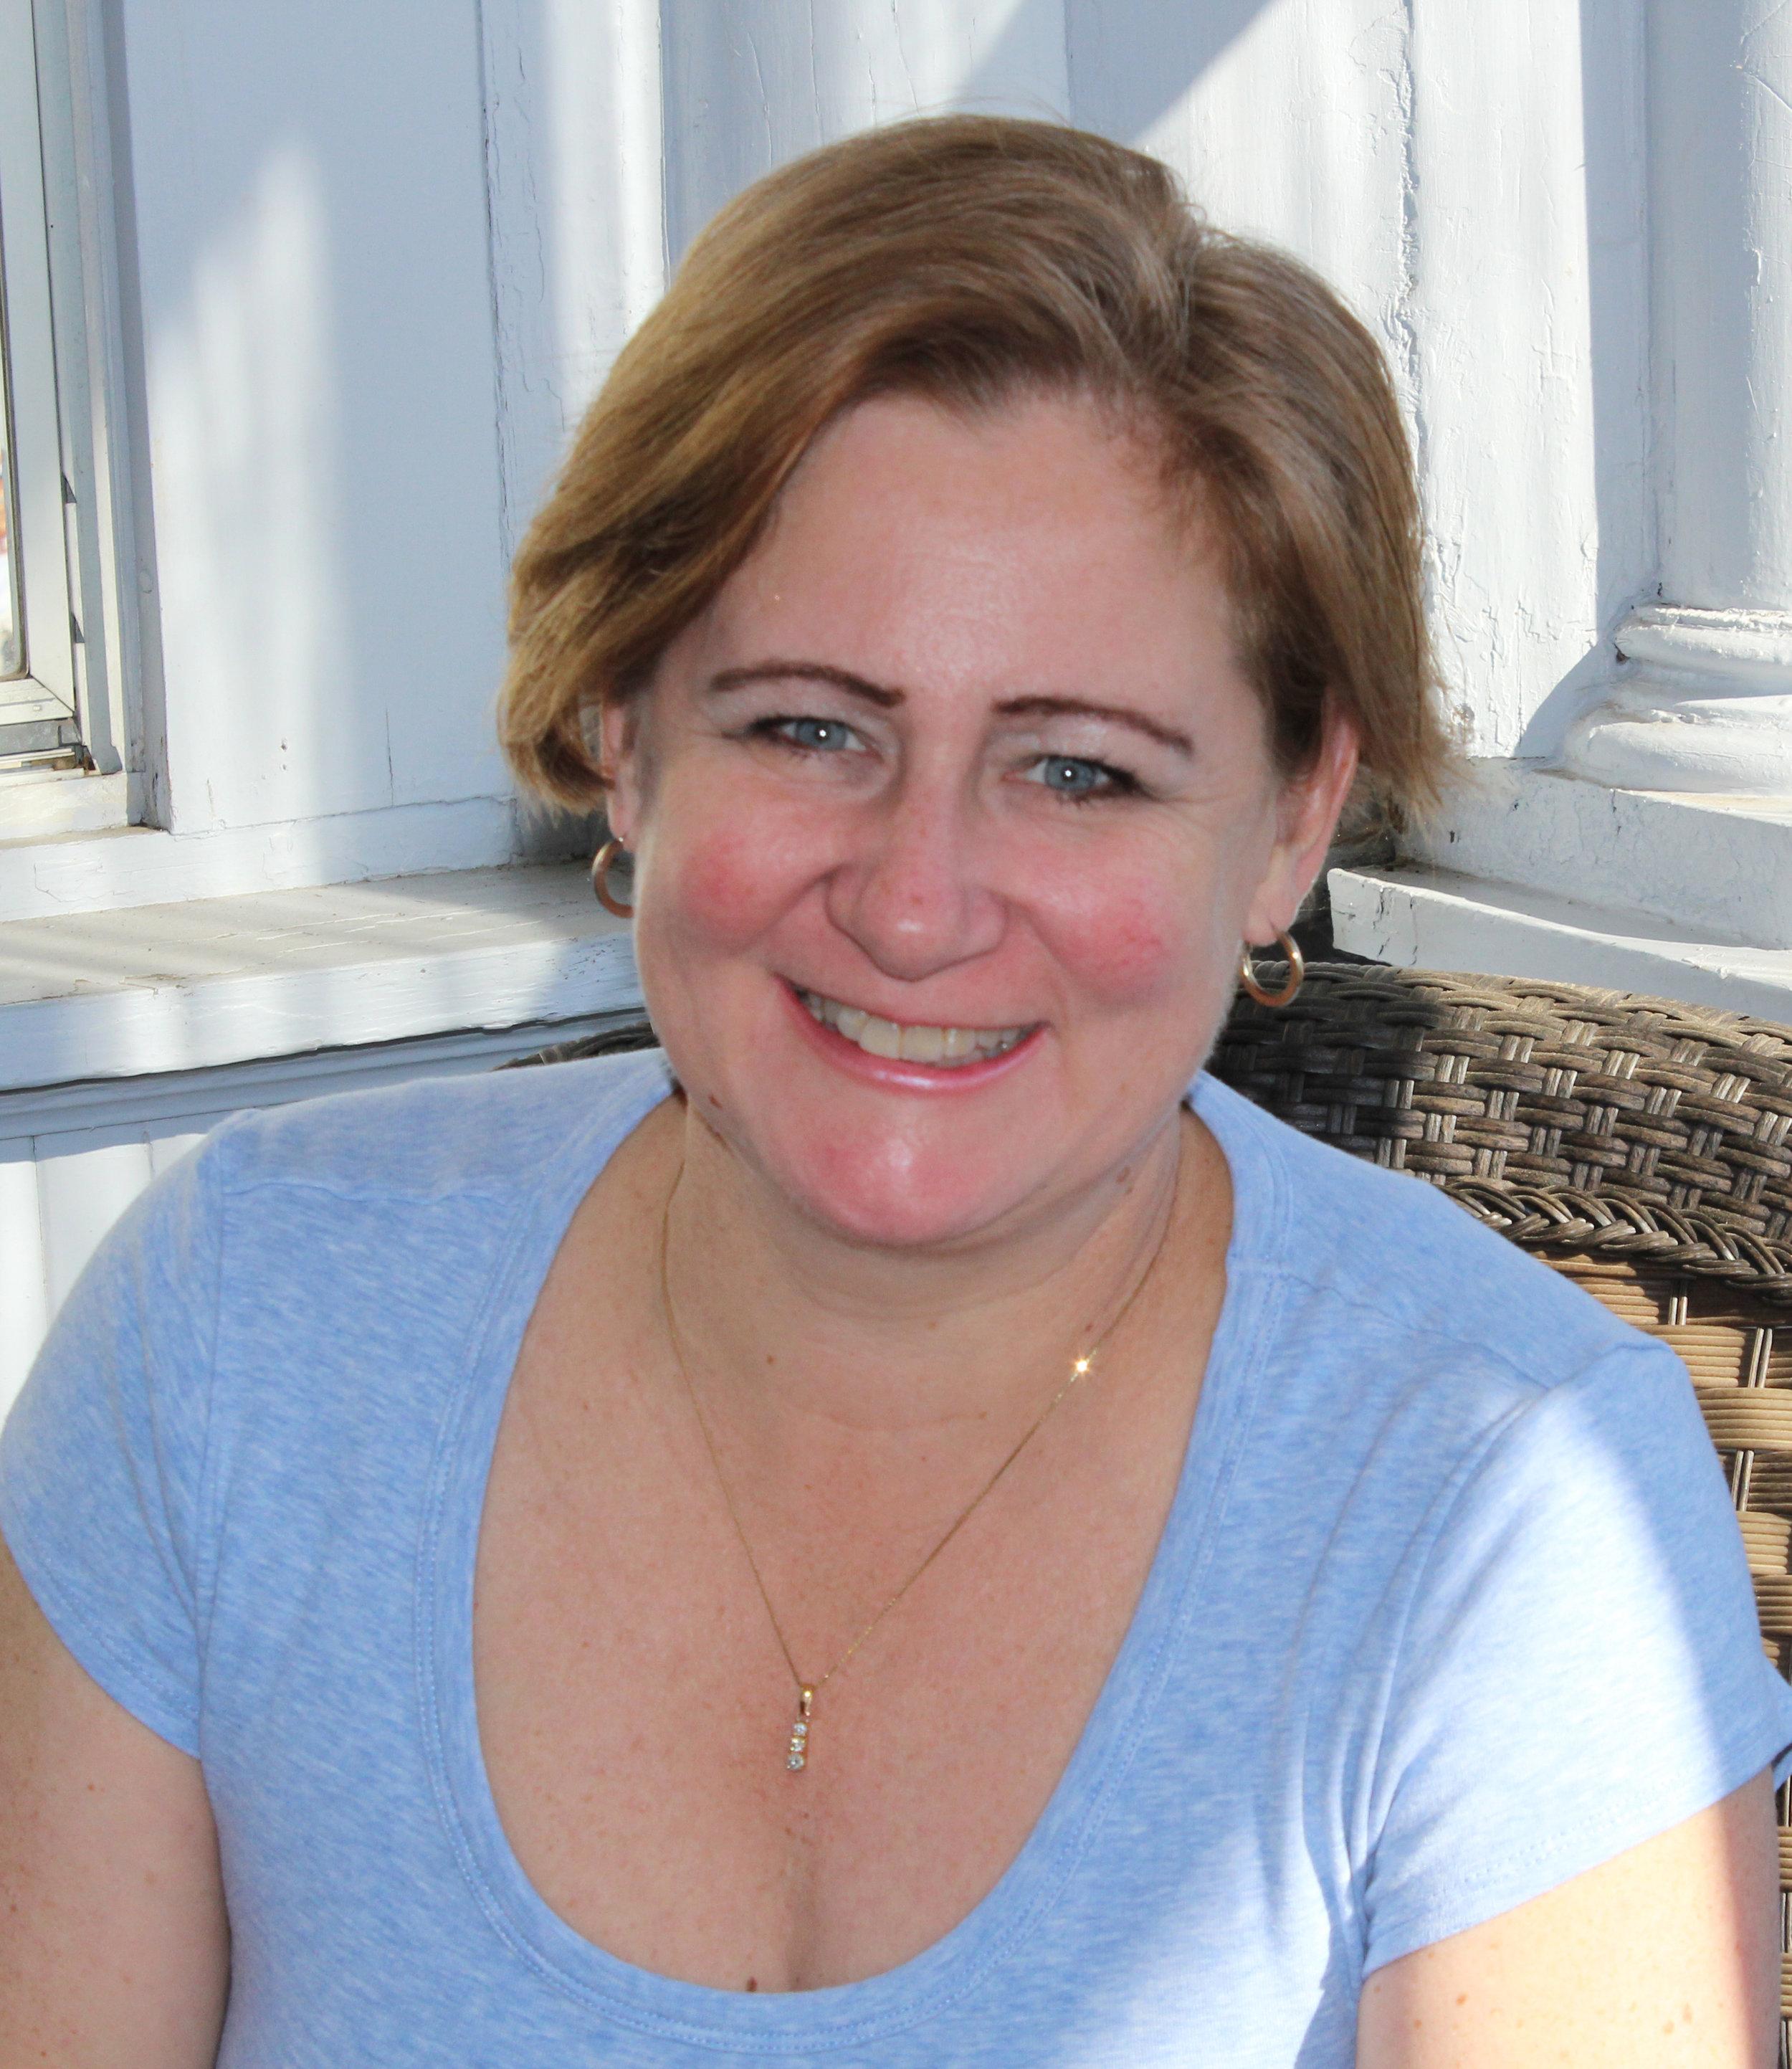 Shaileen Landsberg, Reiki Master, Certified Life Coach, Founder of Seek Your Center